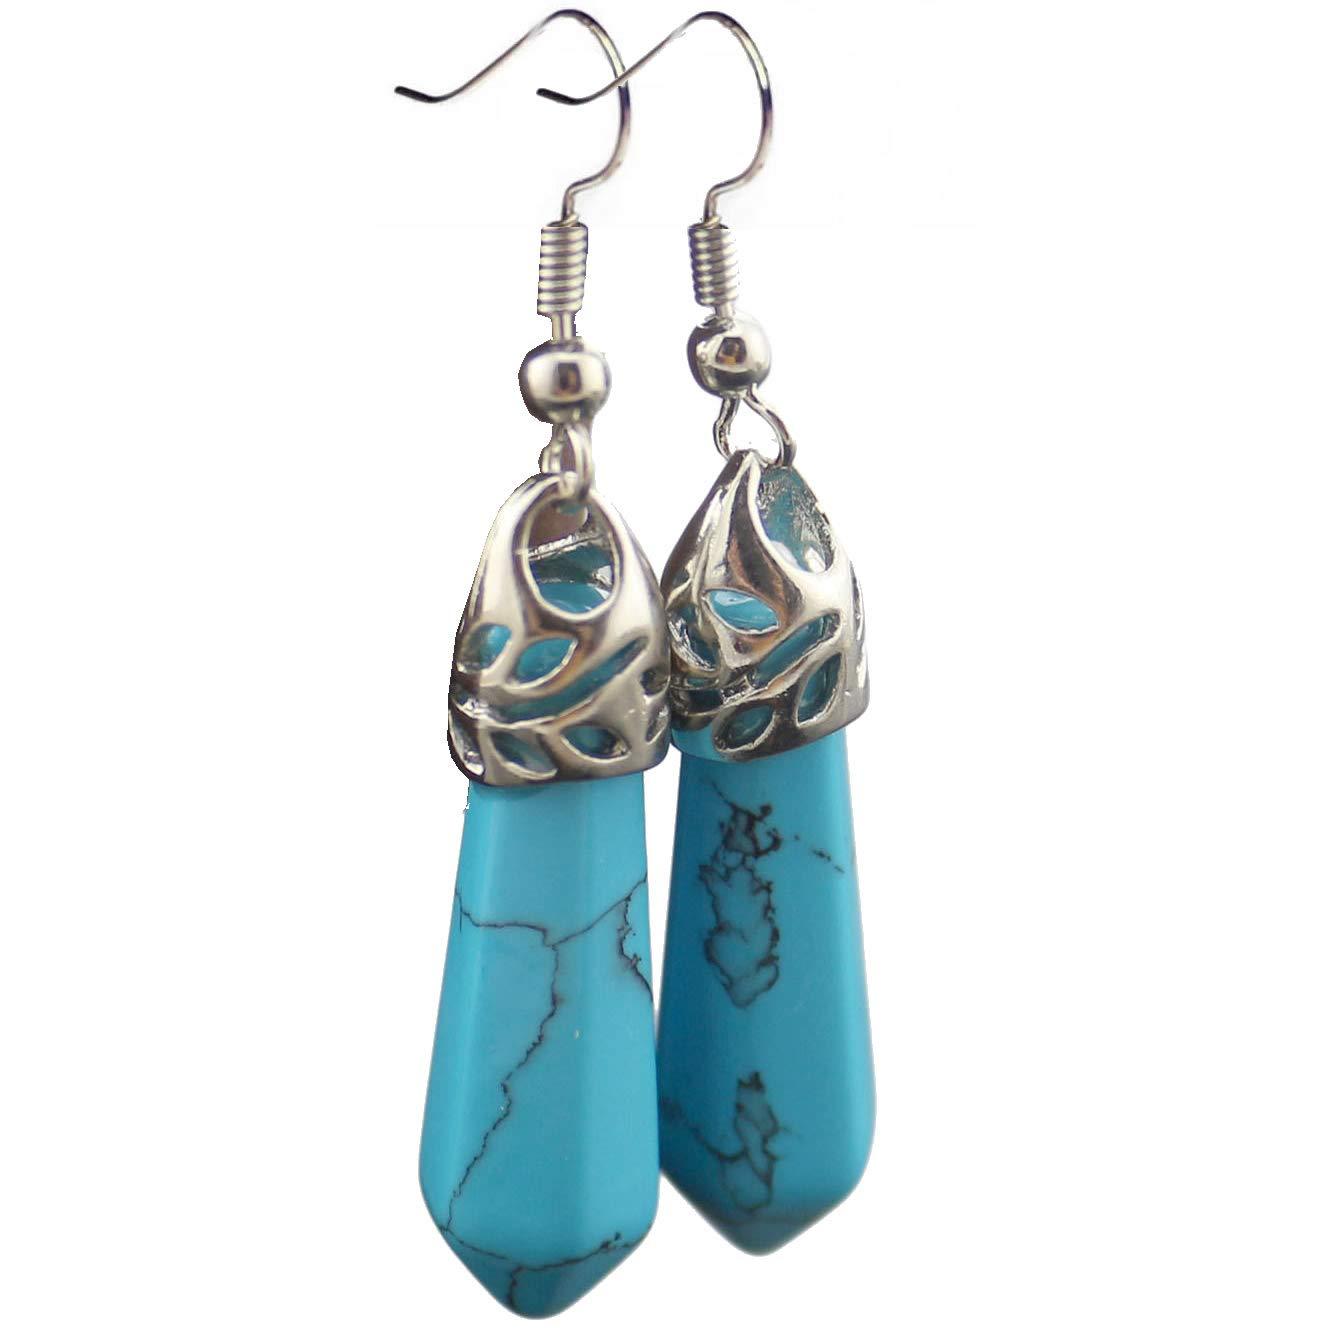 Natural Gemstone Earrings Bullet Healing Point Crystal 7 Chakra Dangle Earrings Xmas Gift